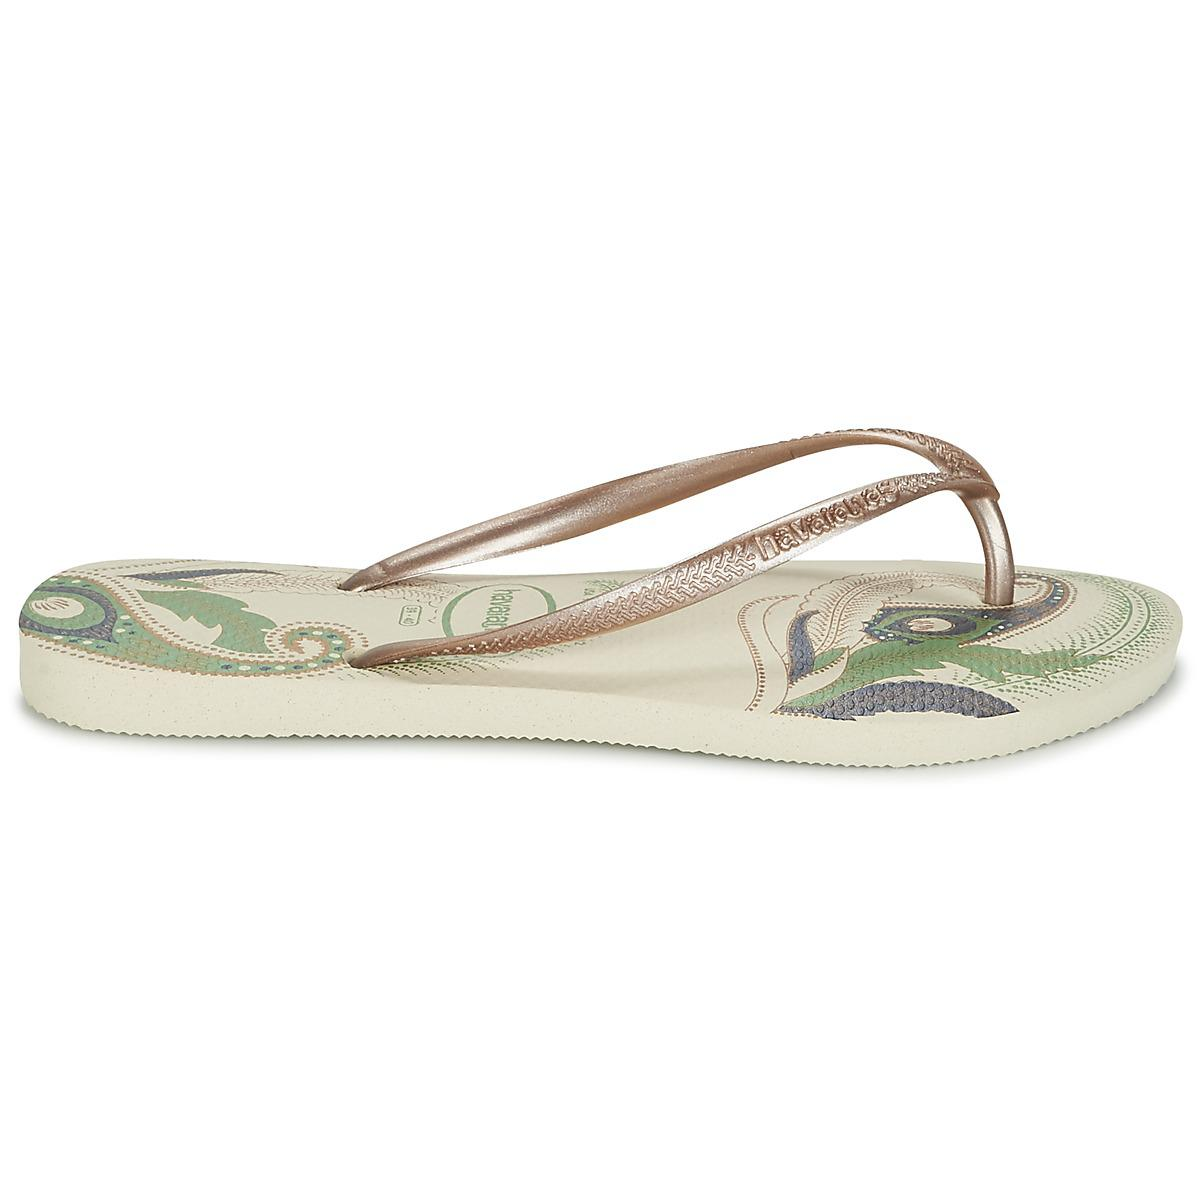 c3221a0c14ca93 ... Havaianas - Natural Slim Organic Flip Flops - Lyst. View fullscreen  online shop 163ae a721d ...